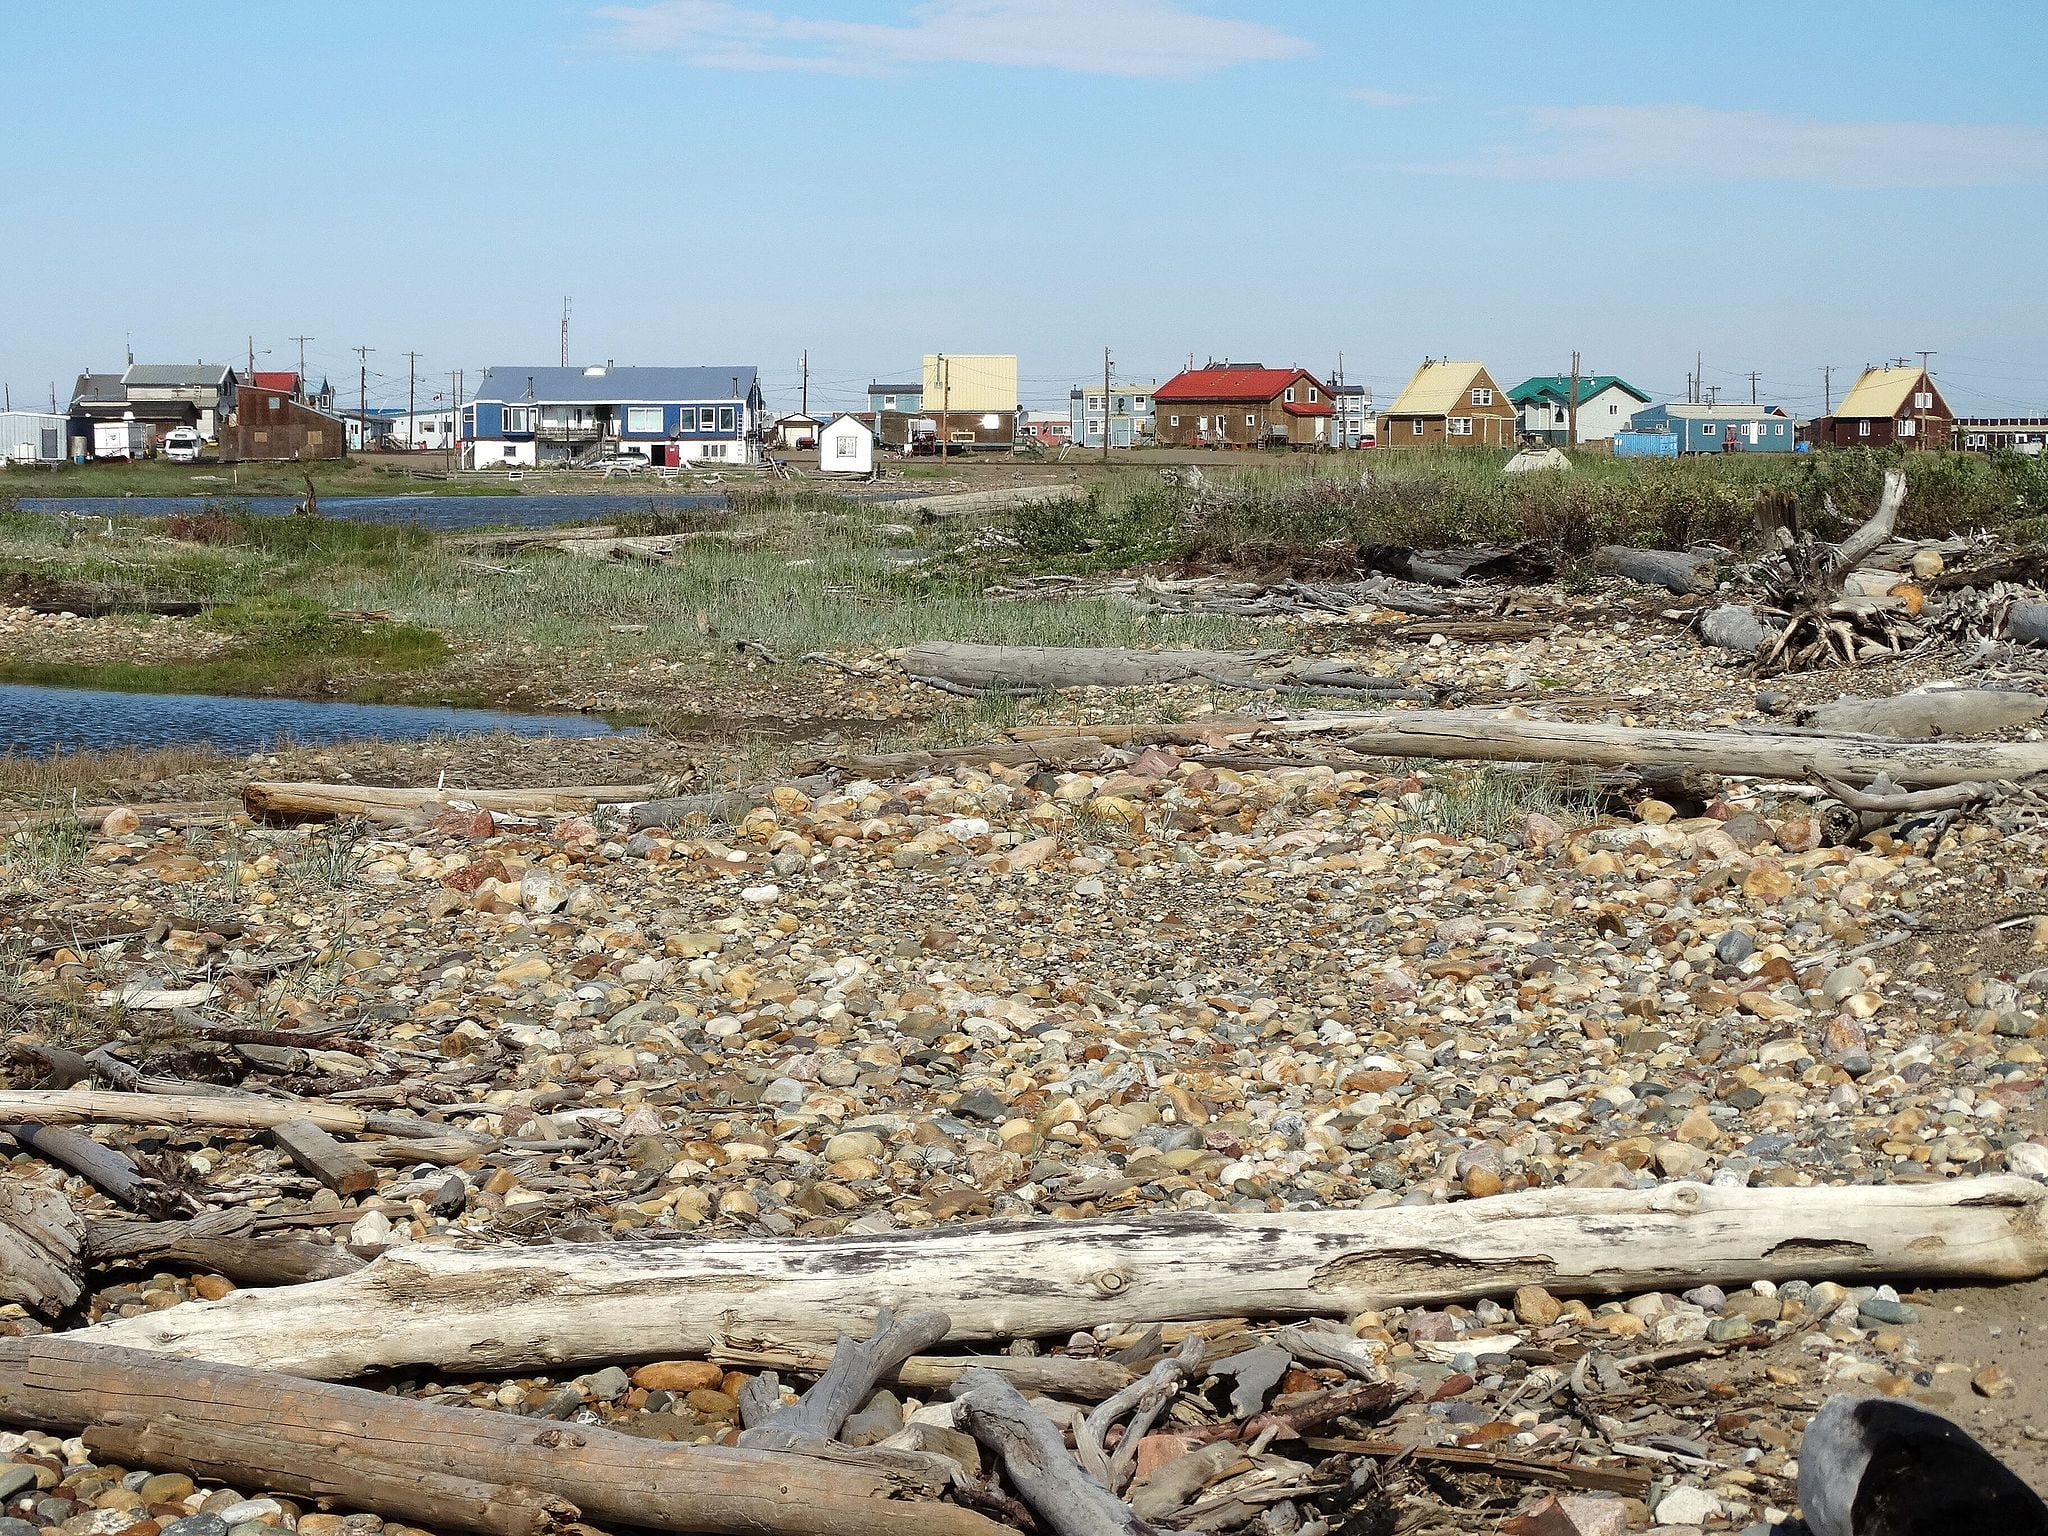 Arctic_Ocean_Shore_and_Settlement_-_Tuktoyaktuk_-_Northwest_Territories_-_Canada_-_01